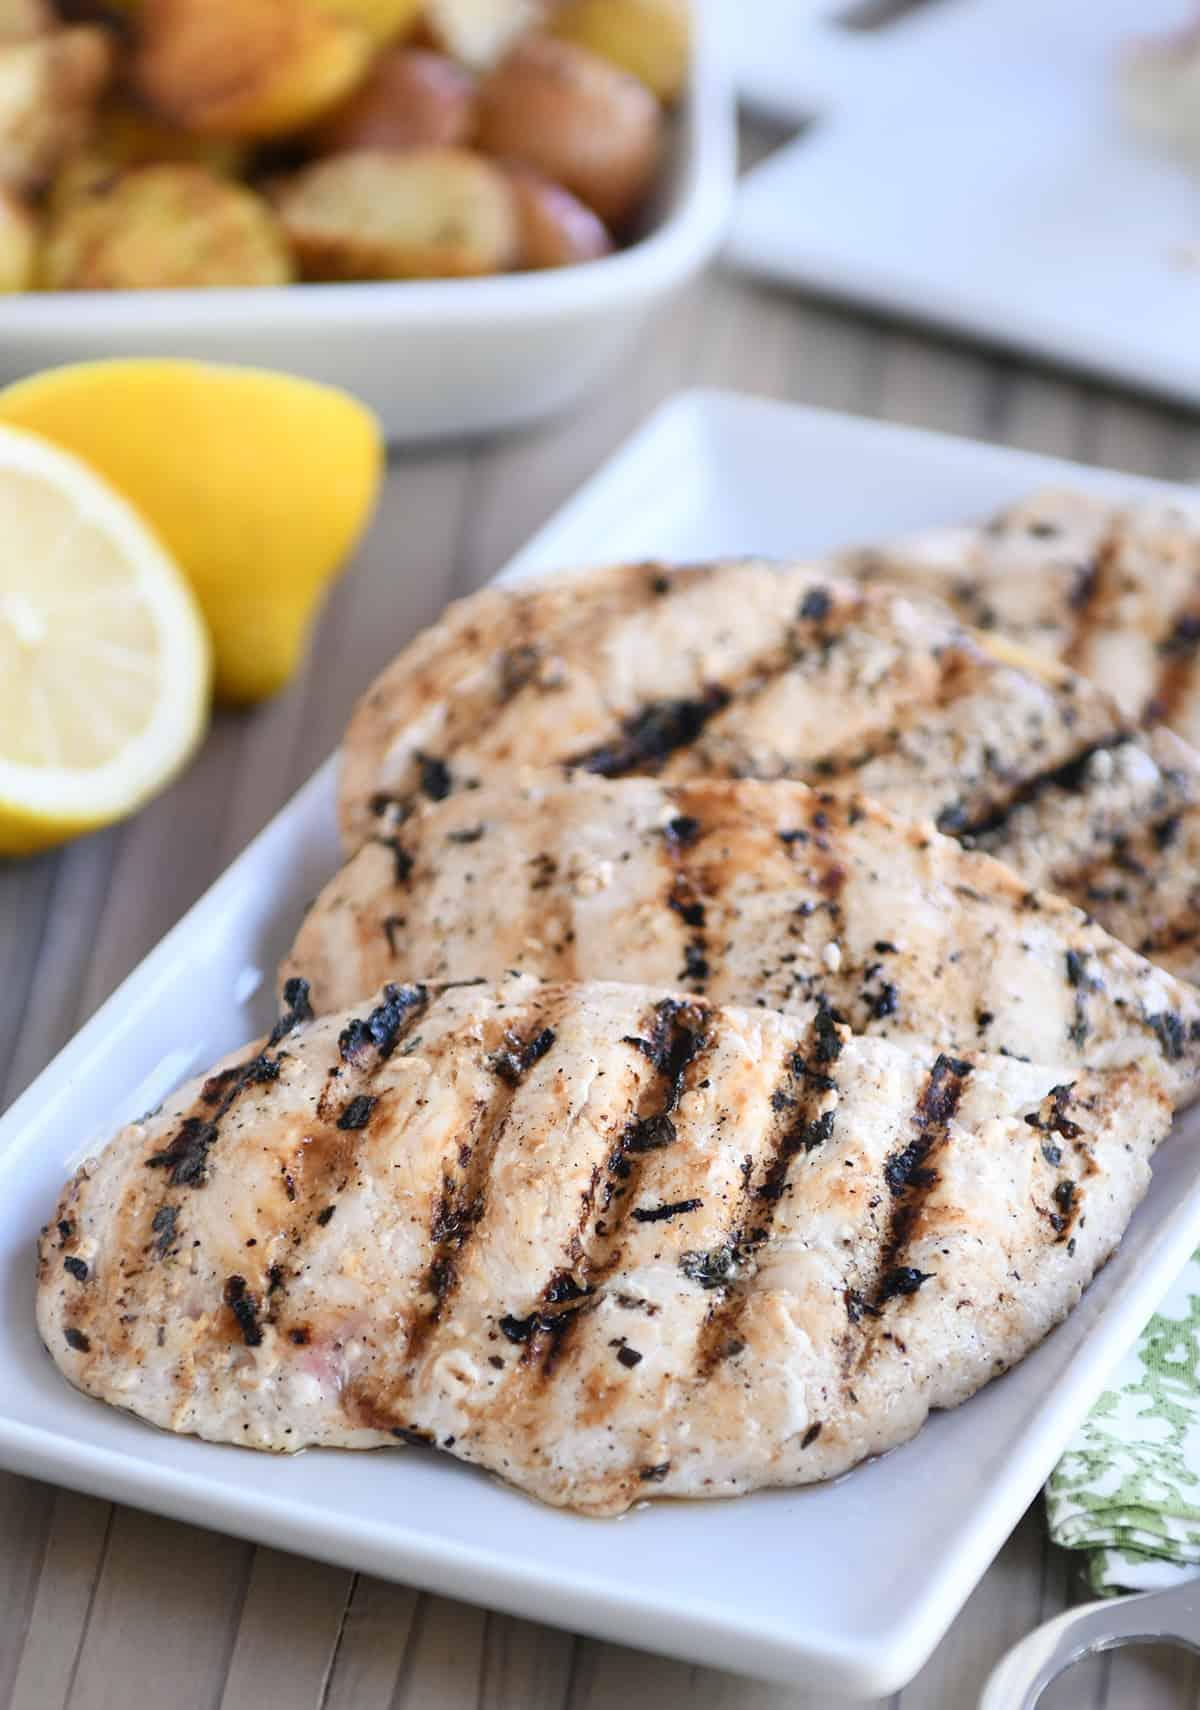 Several lemon garlic grilled chicken breasts on white platter.